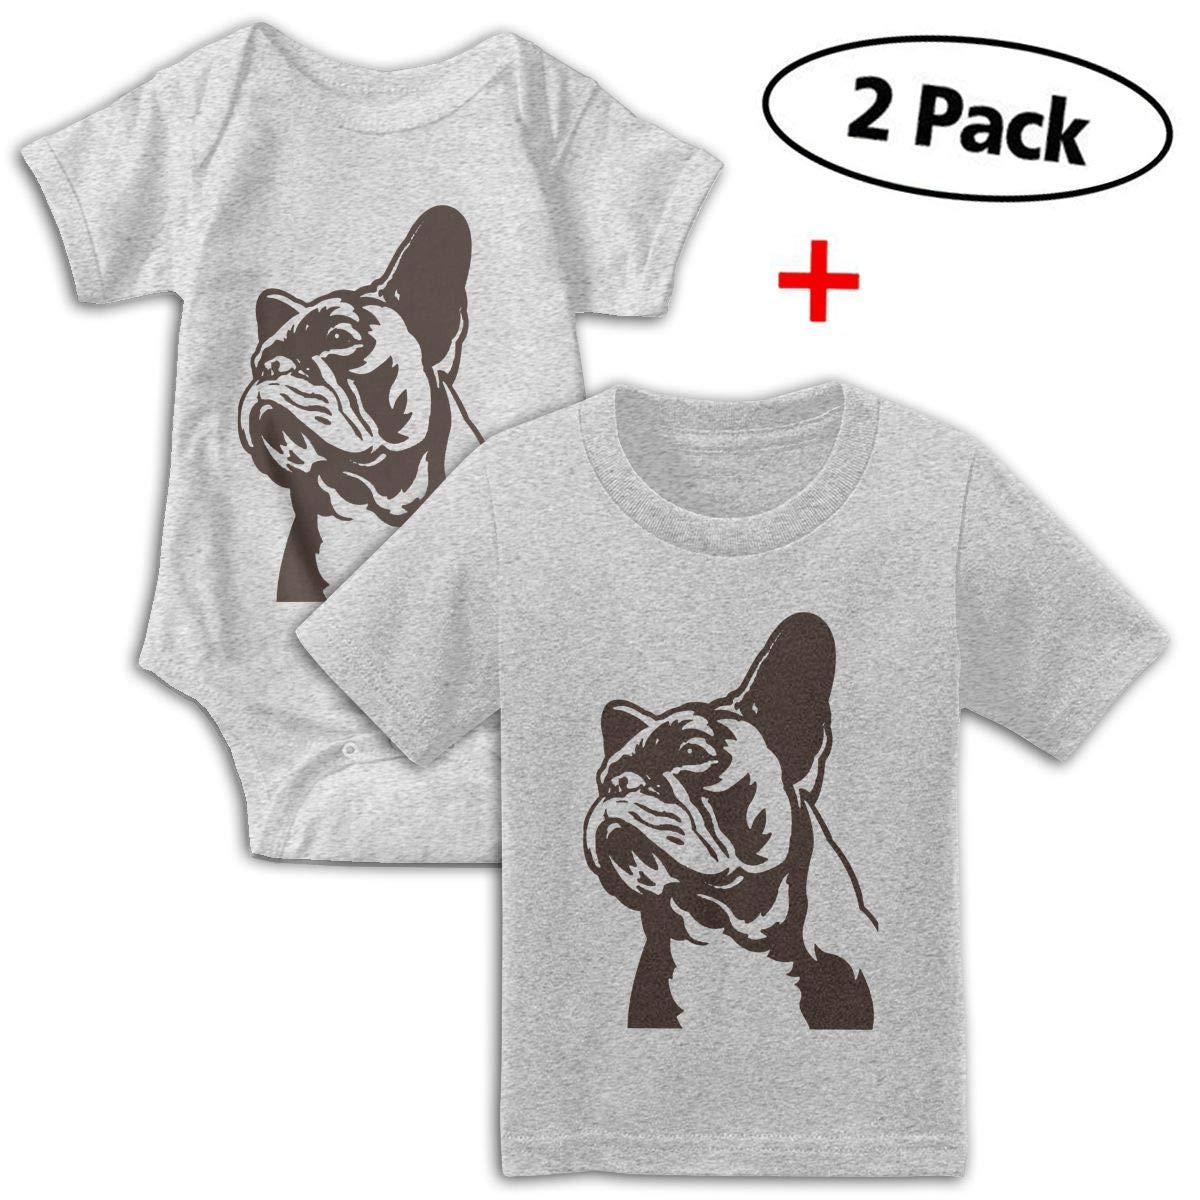 KAYERDELLE French Bulldog Babys Boys /& Girls Short Sleeve Baby Climbing Clothes and Tee